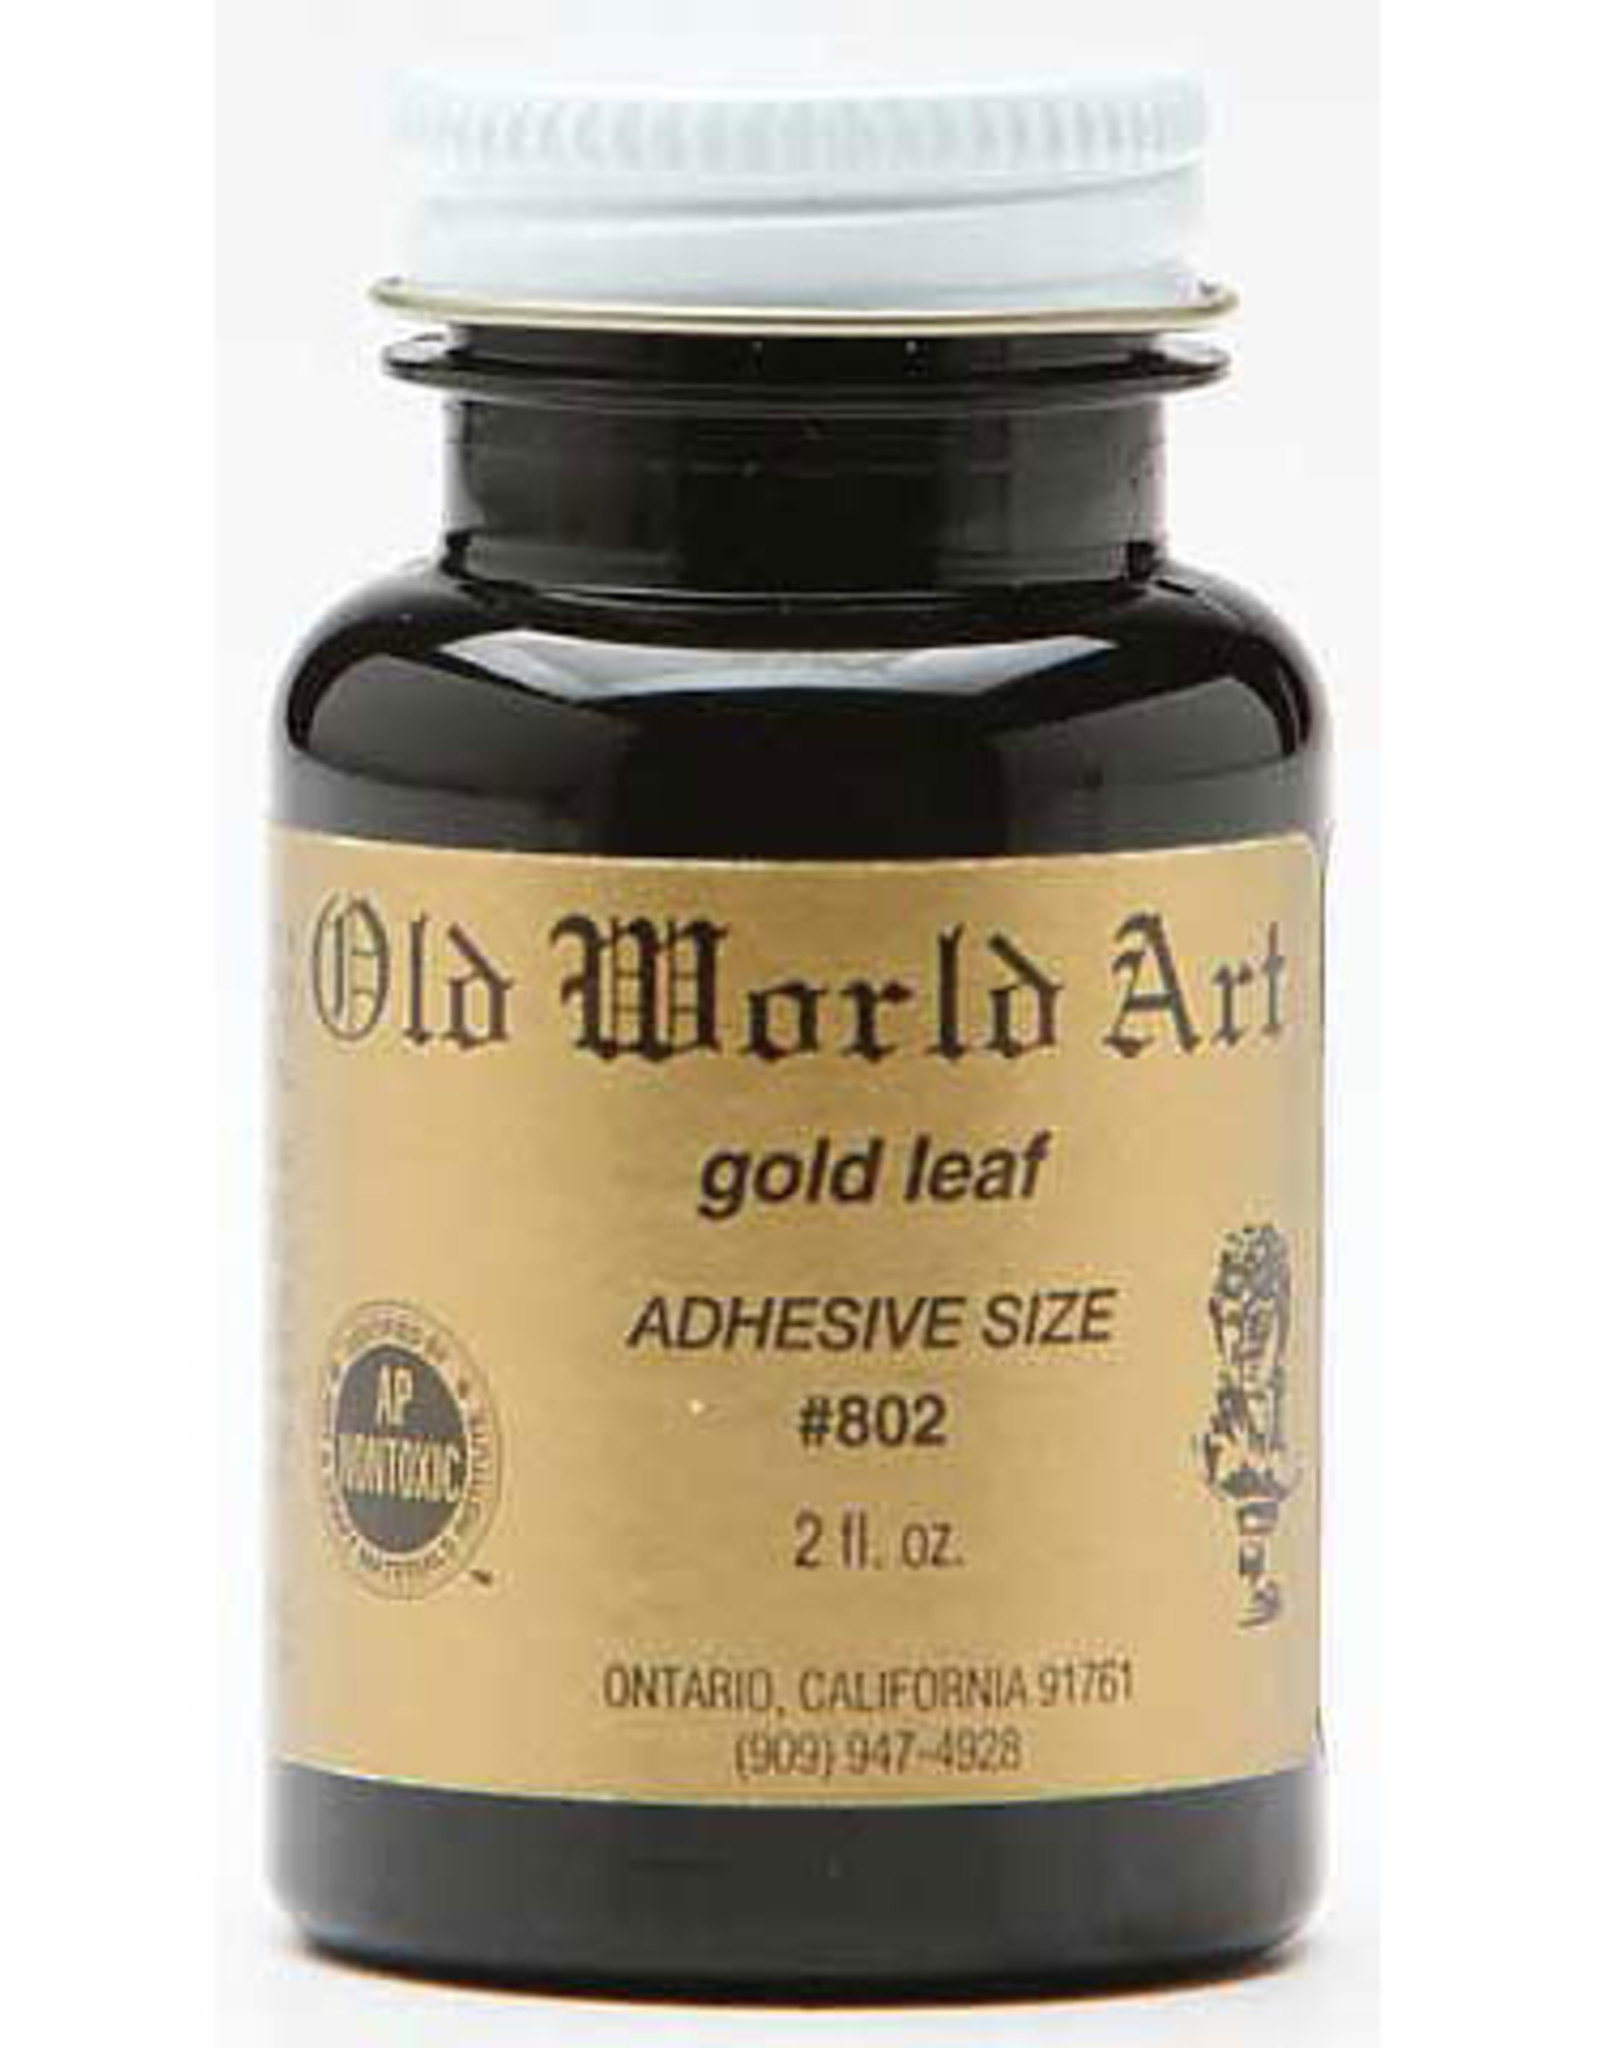 Gold Leaf Adhesive 2 oz